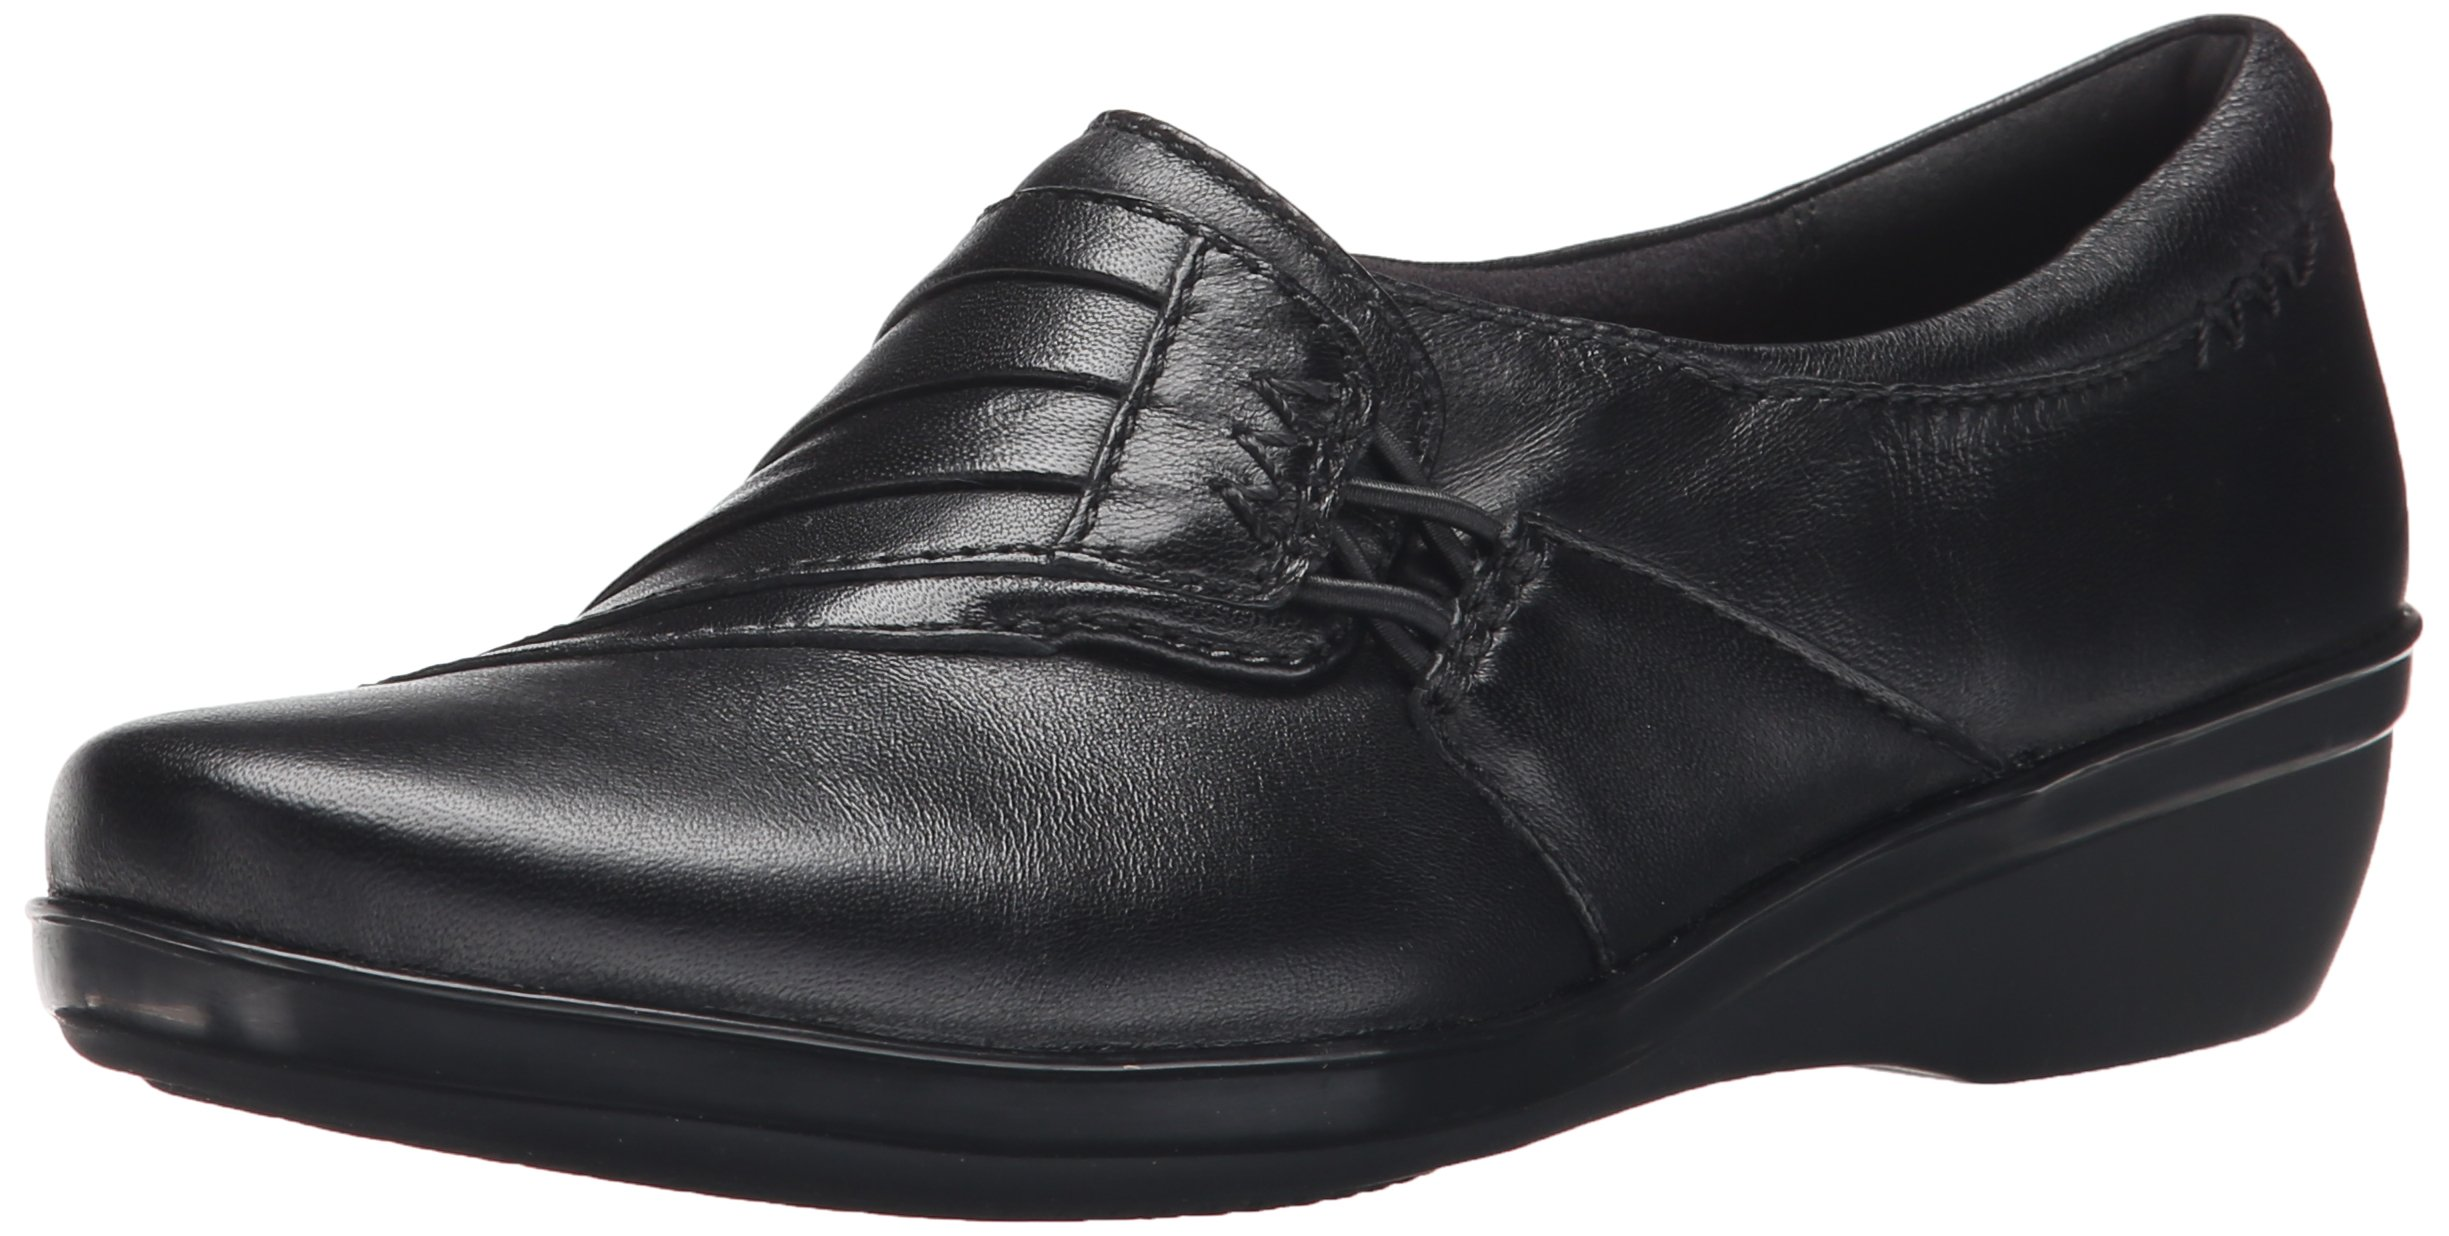 CLARKS Women's Everlay Iris Slip-on Loafer, Black Leather, 10 W US